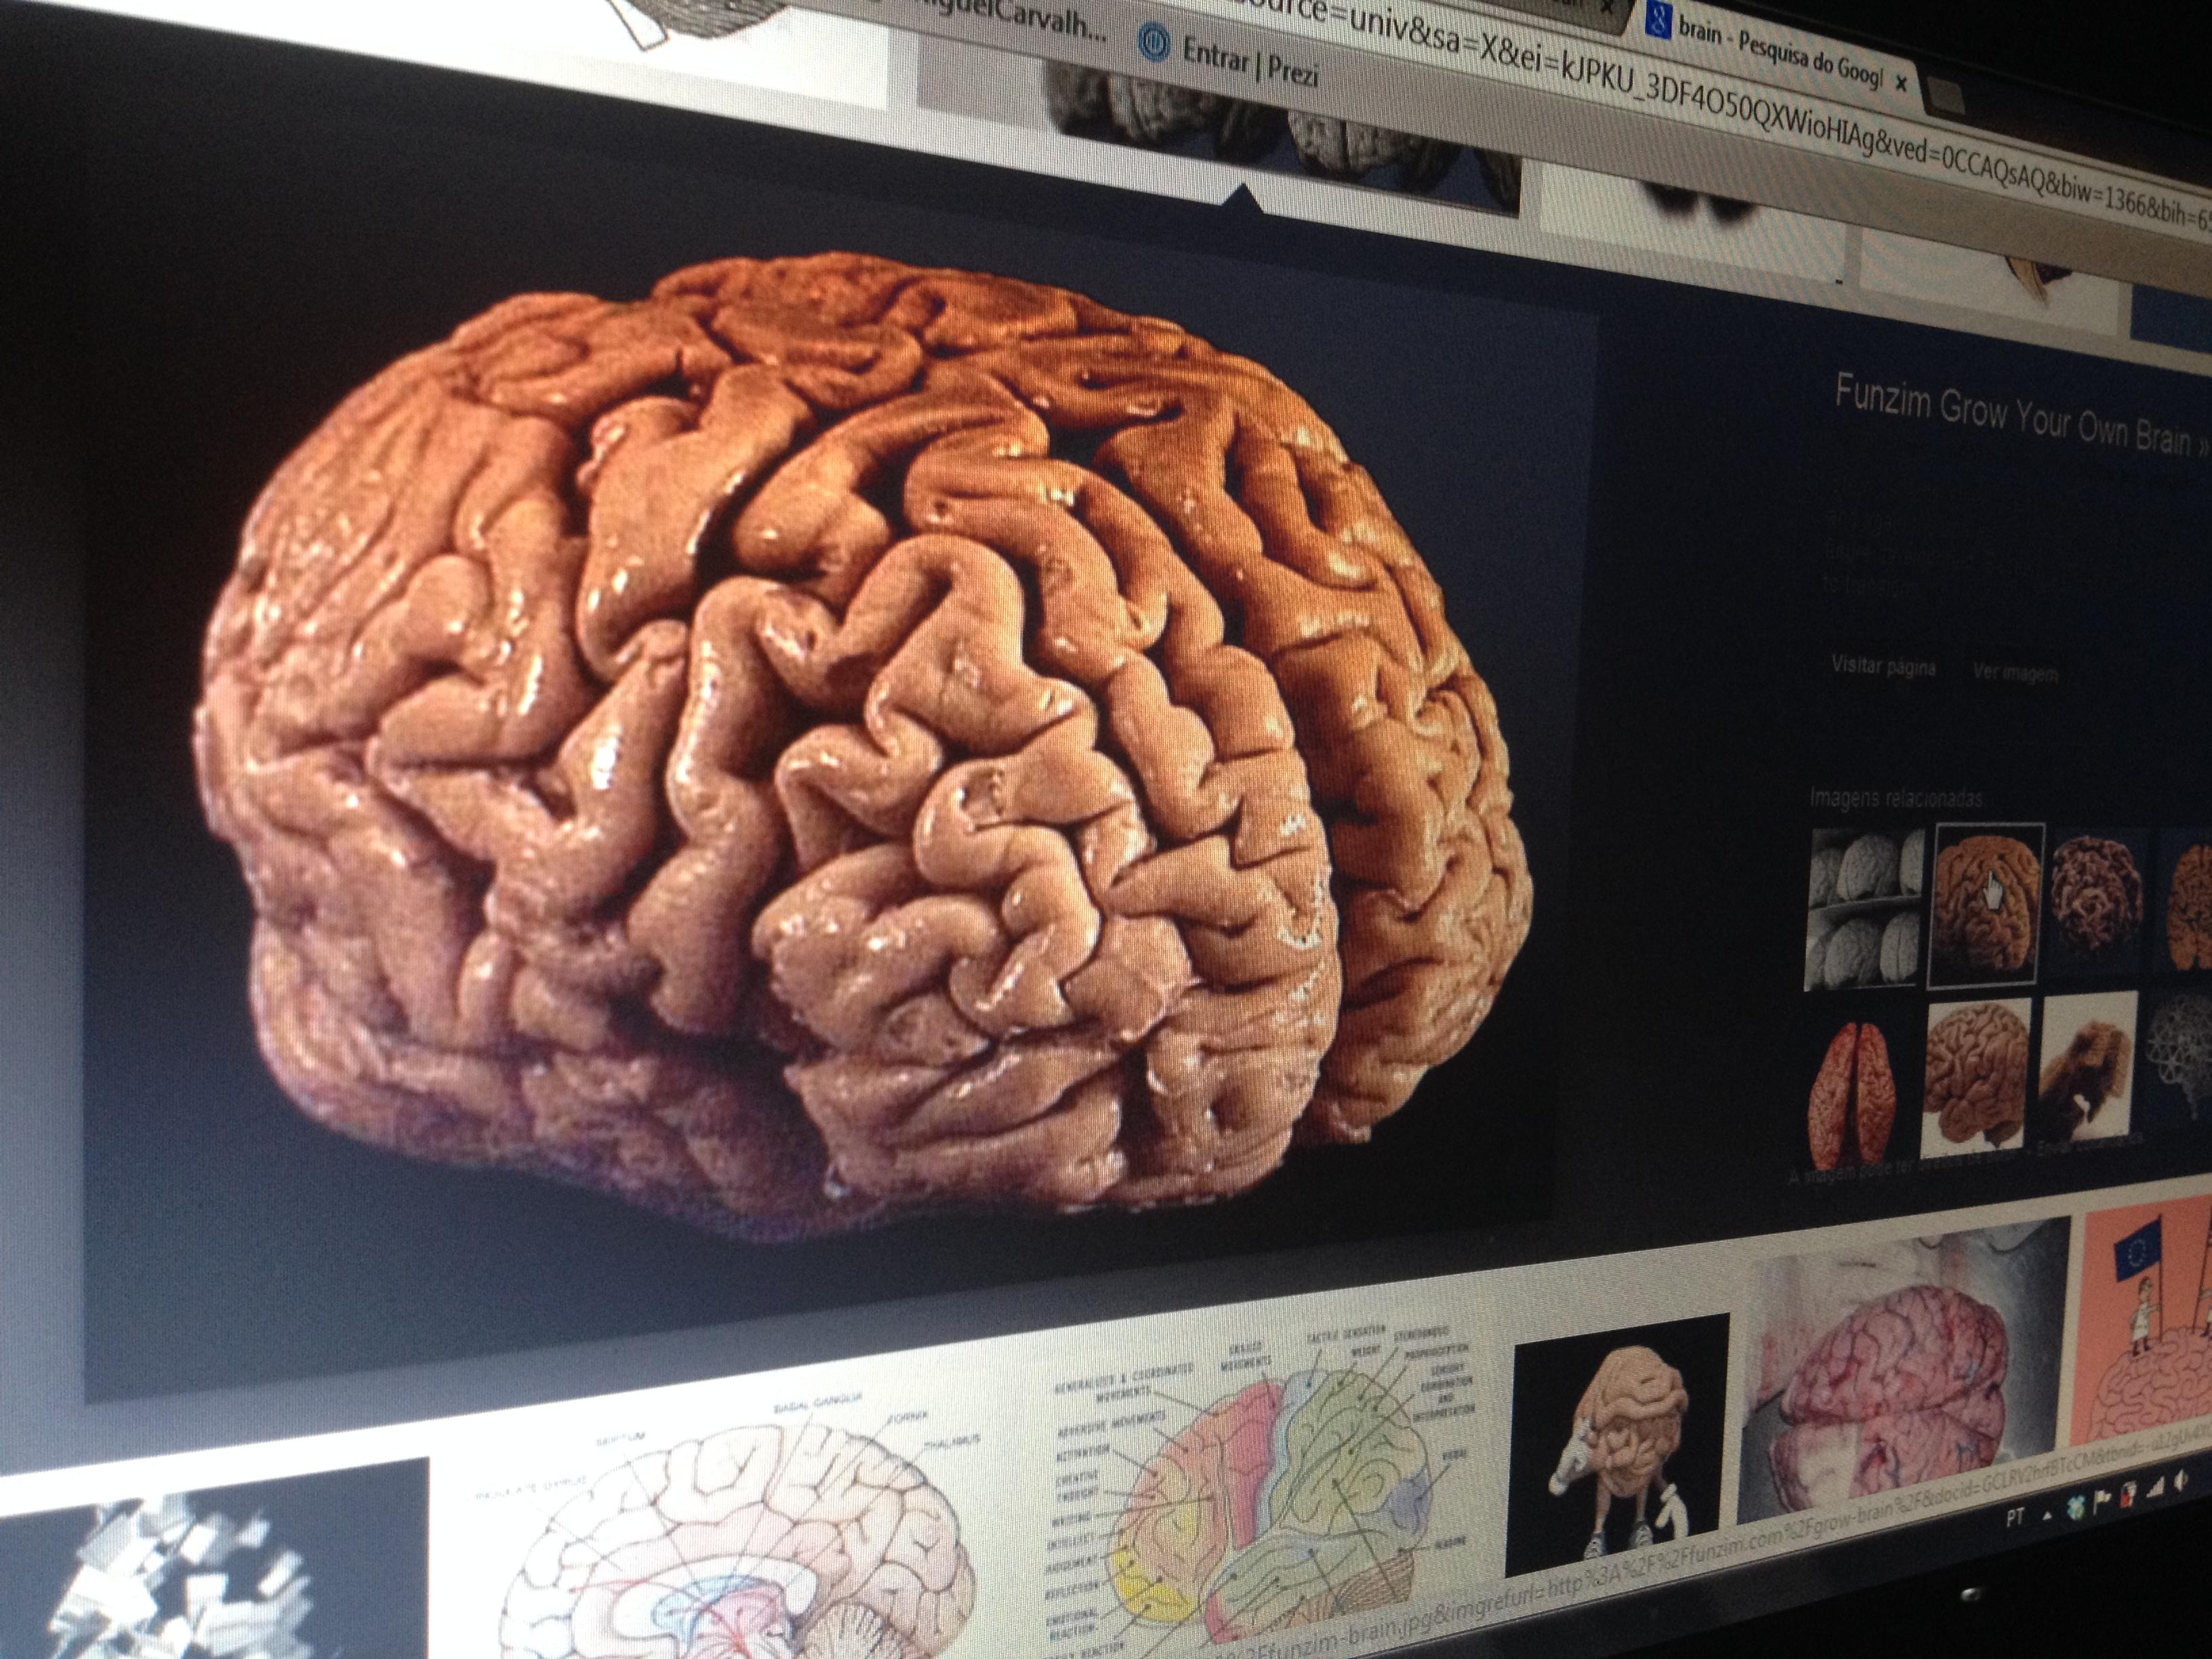 cérebro foto